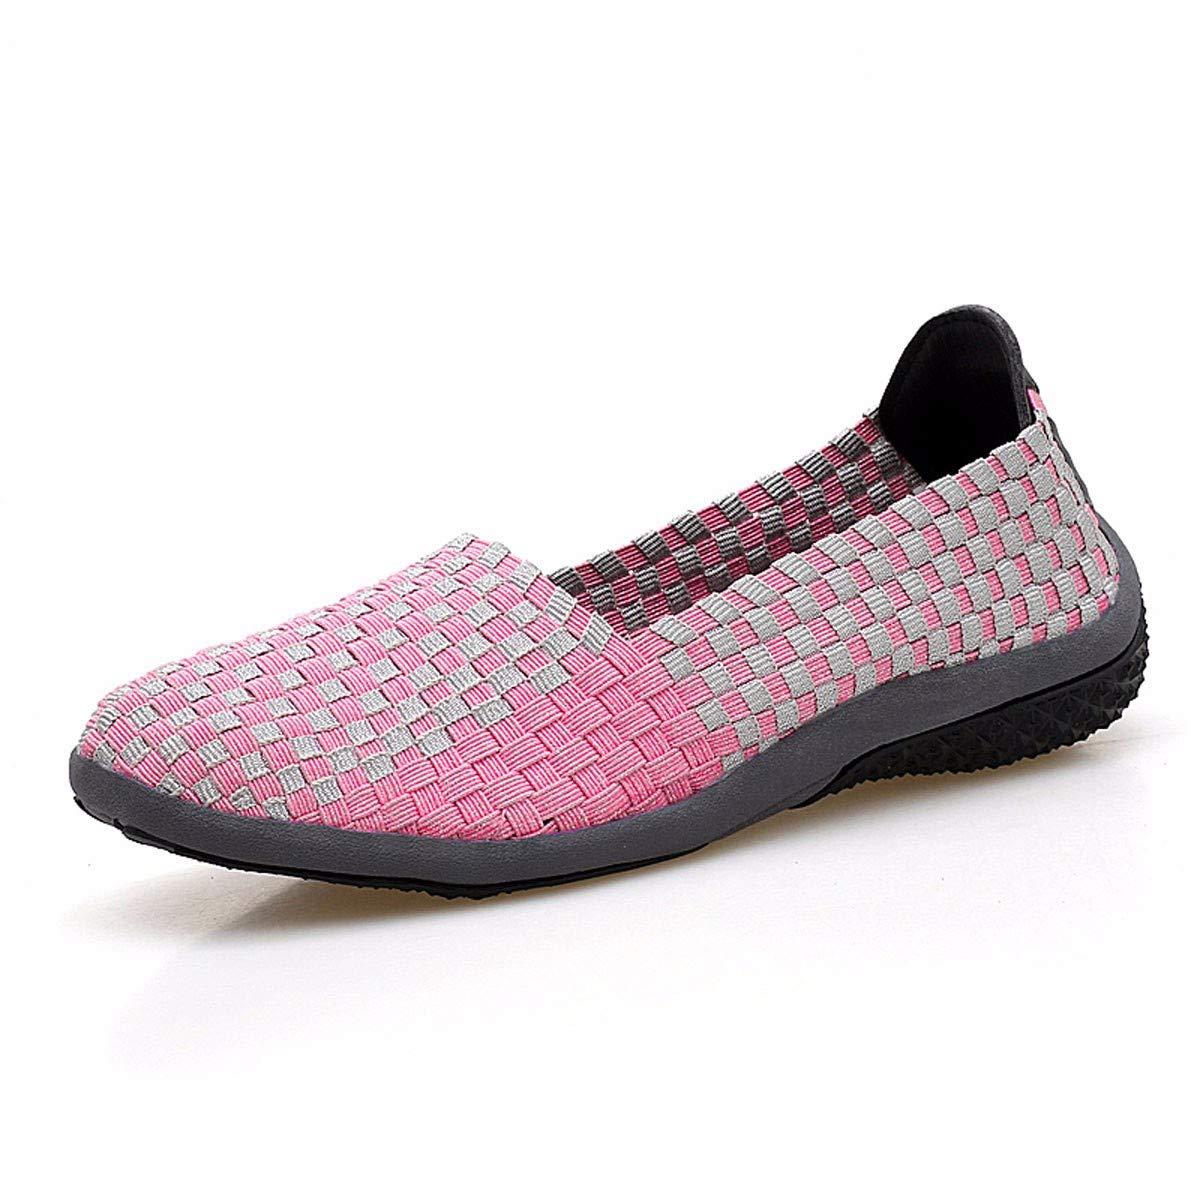 KPHY Damenschuhe/Freizeit Damenschuhe Schwarze Schuhe Ein Pedal Faul Schuhe Flachen Sohle Mutter Schuhe Atmungsaktiv Aus Weichen Sohle Tanzschuhe S.Grau